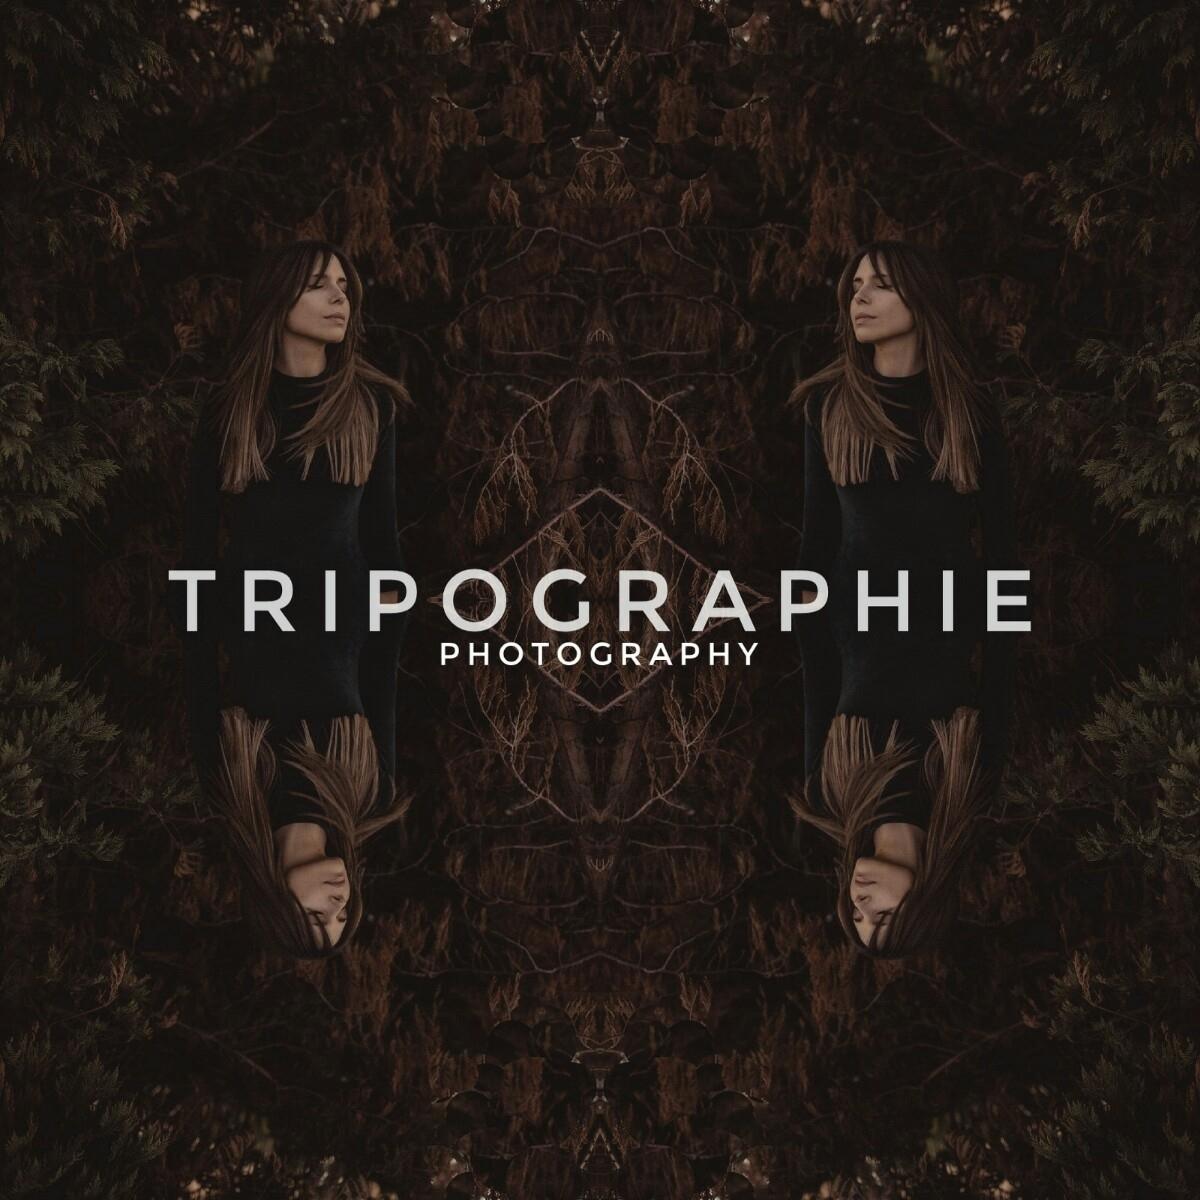 Pedro Granda (@tripographie) Cover Image